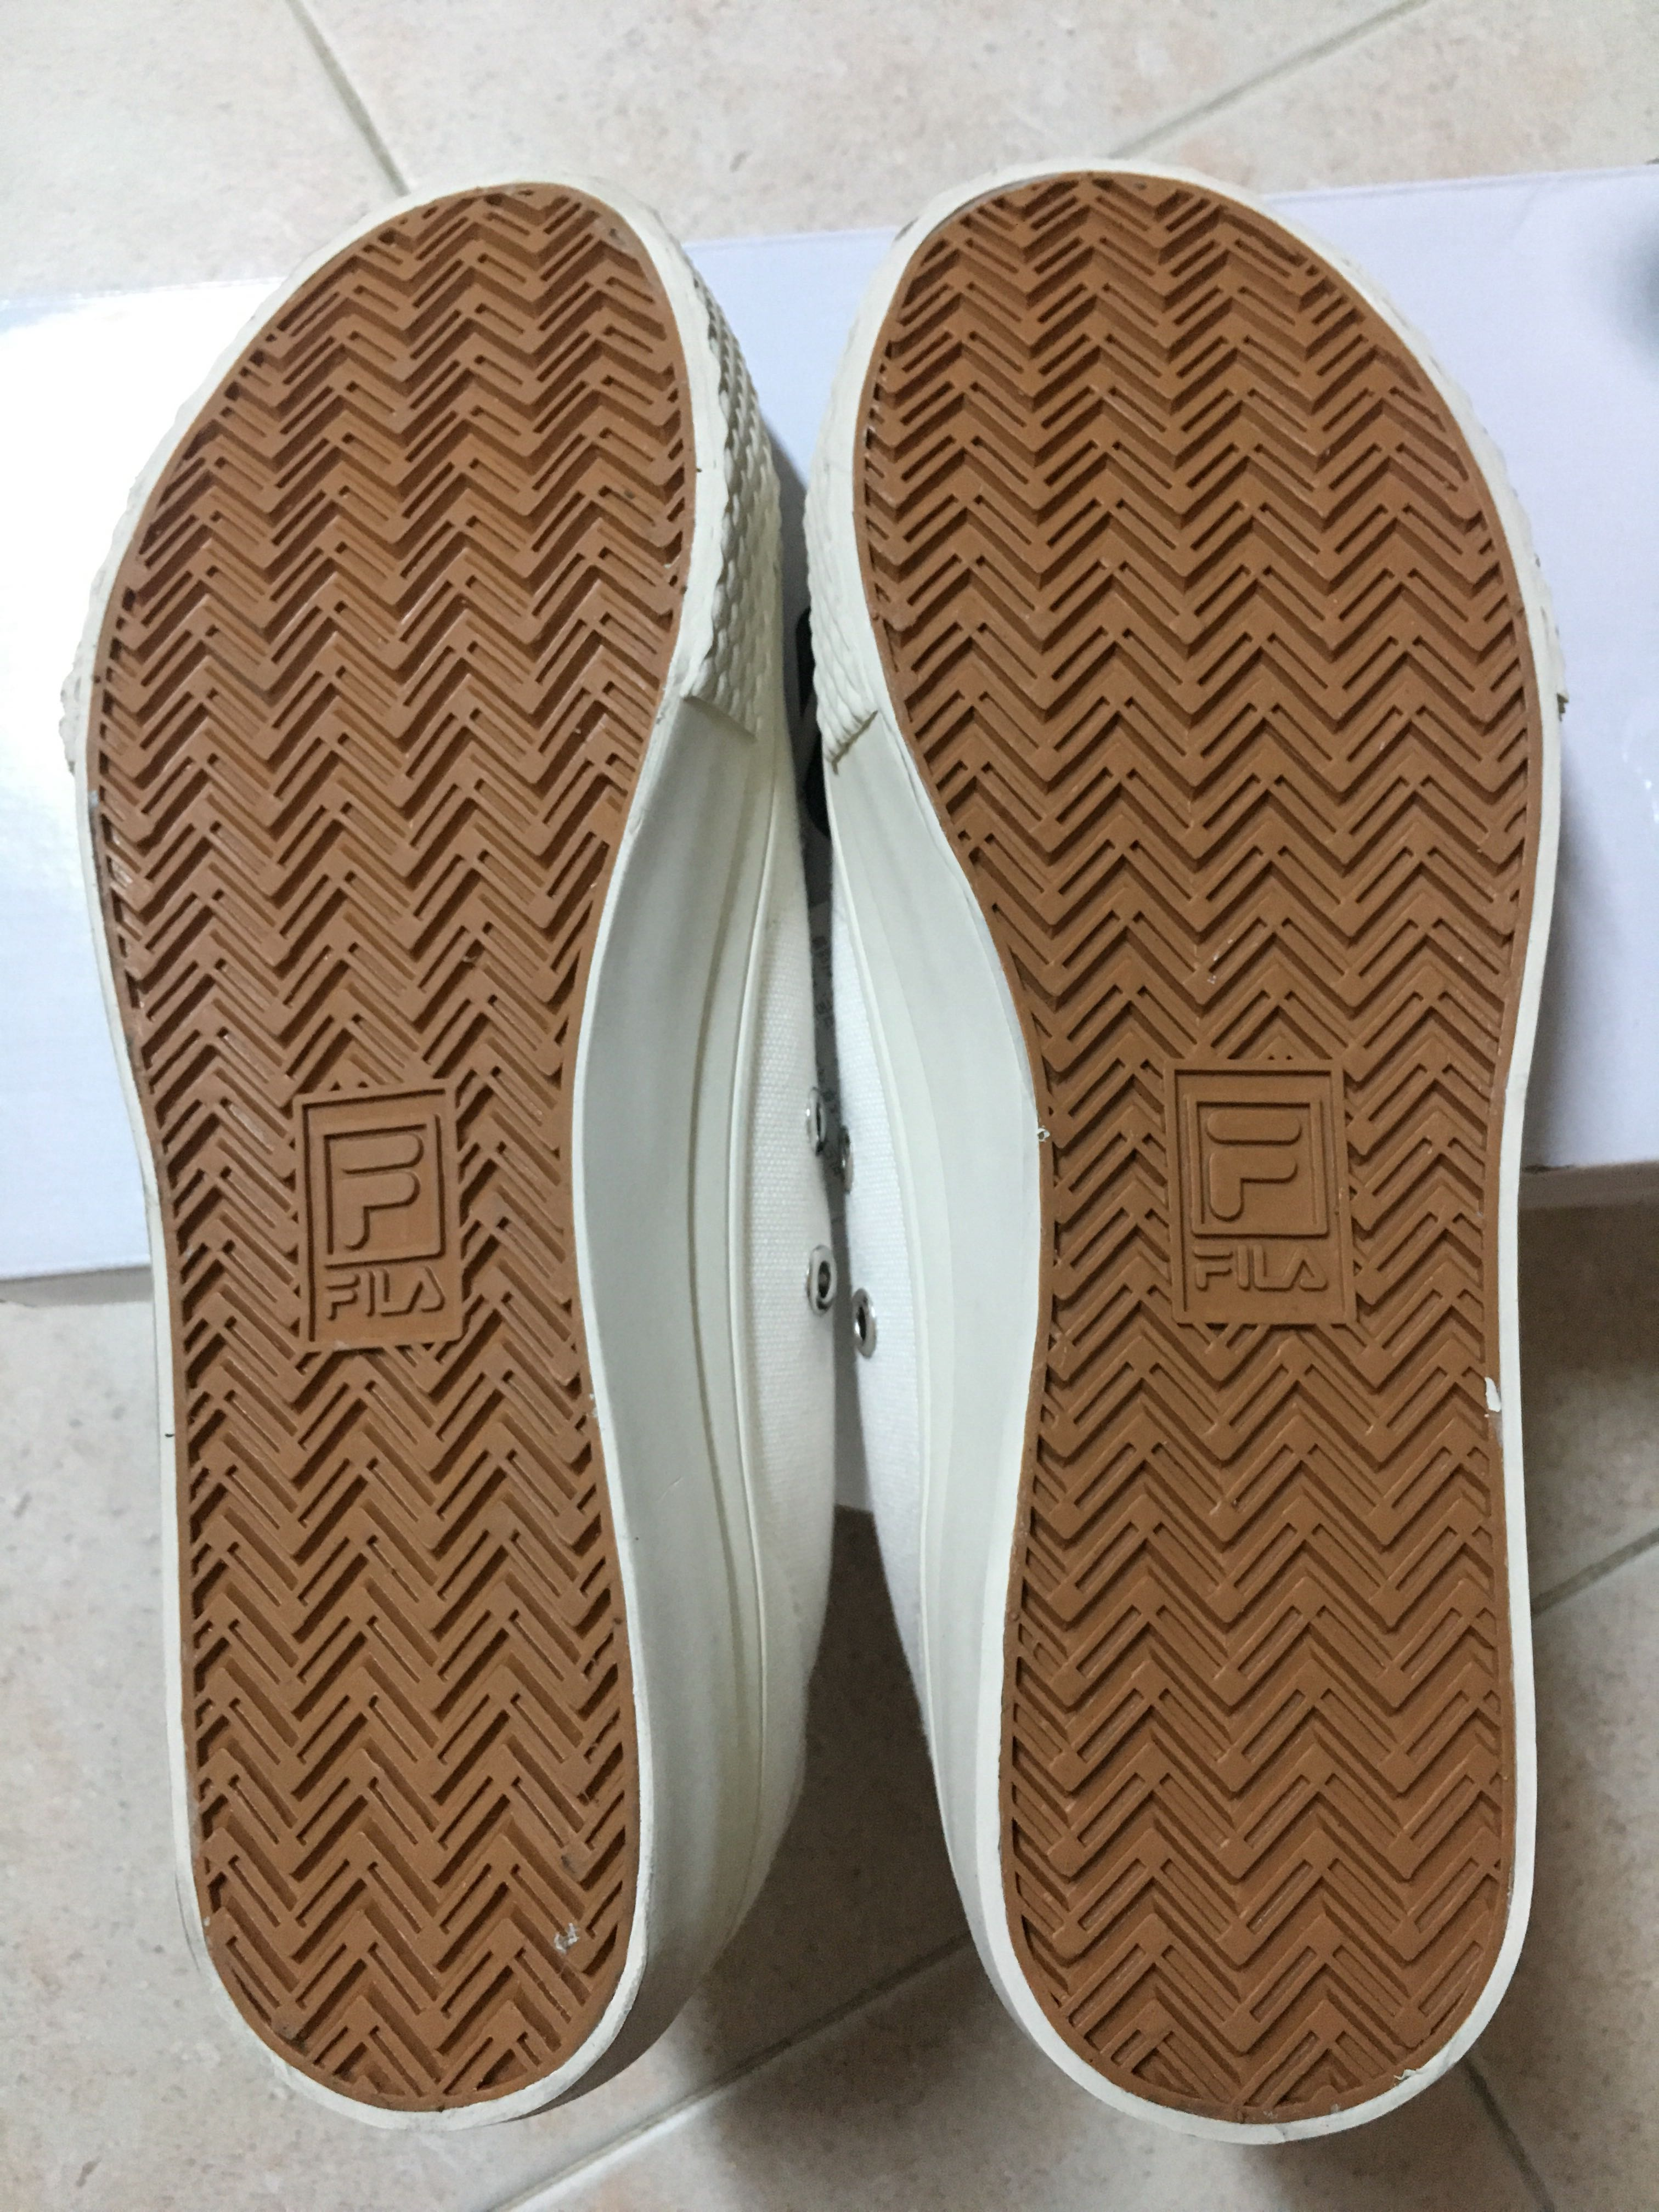 0d790761d35106 Fila classic kicks B (off white )